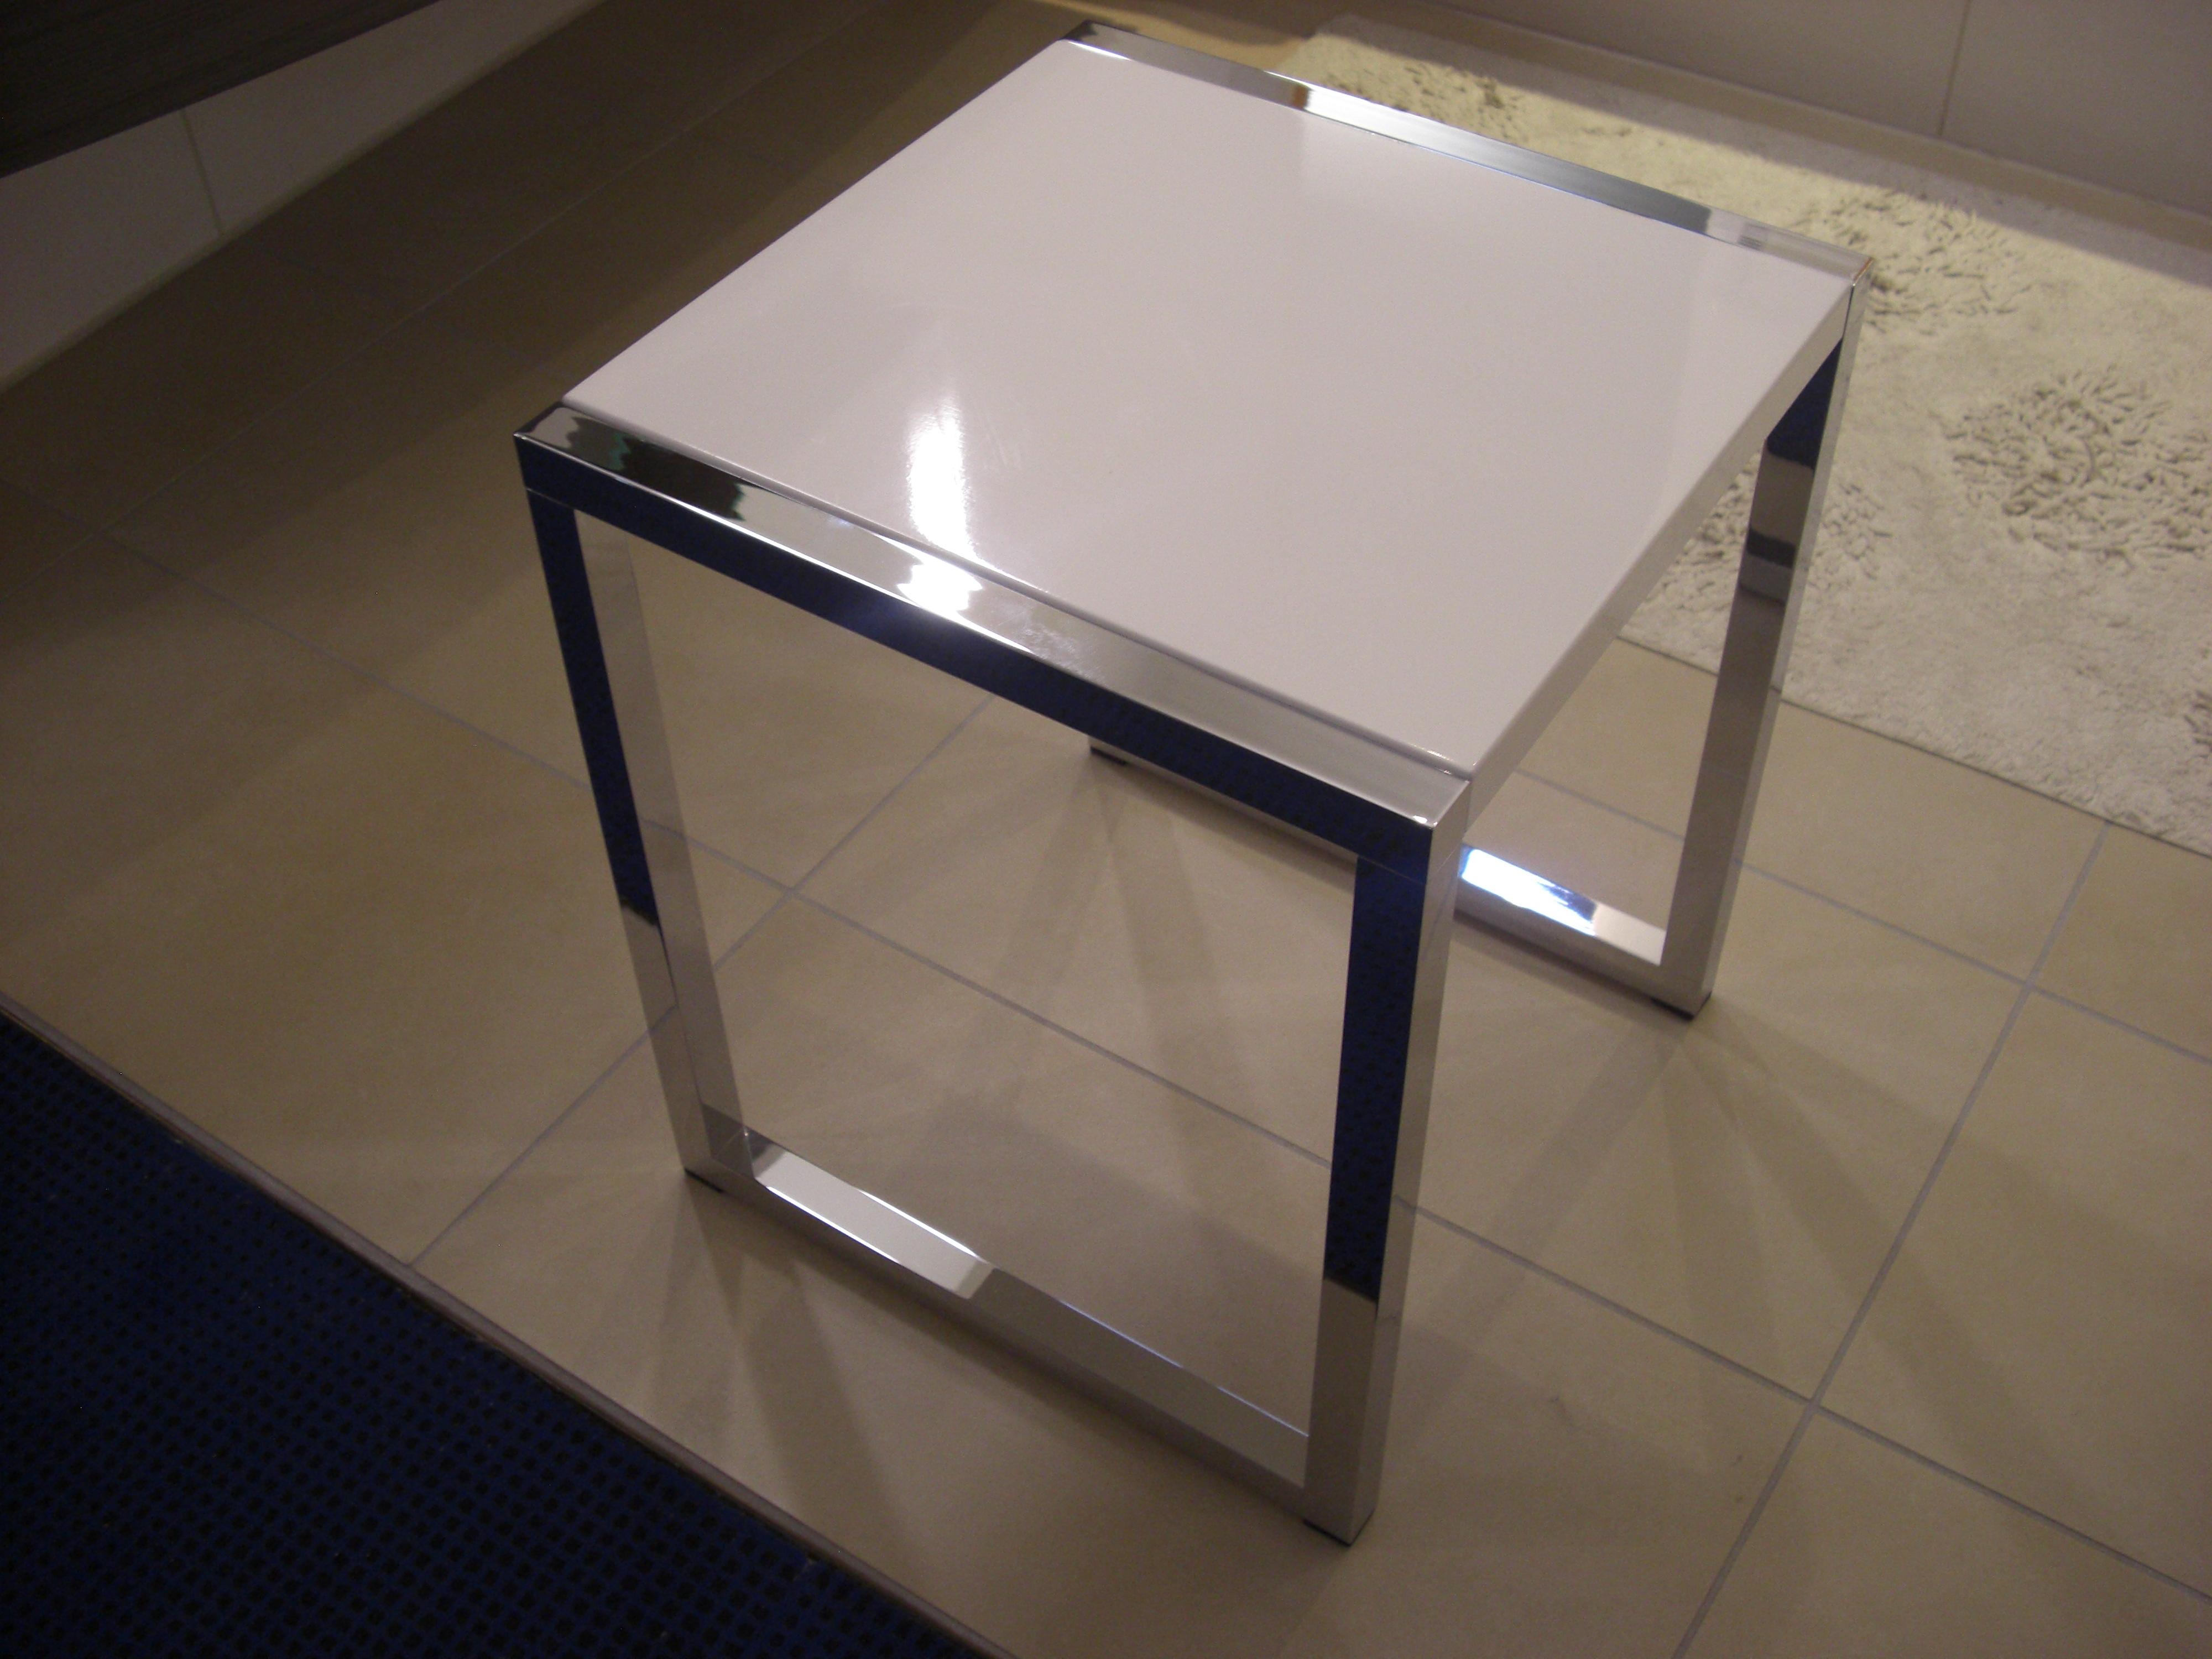 hewi system 100 hocker sitzgelegenheit am waschbecken. Black Bedroom Furniture Sets. Home Design Ideas